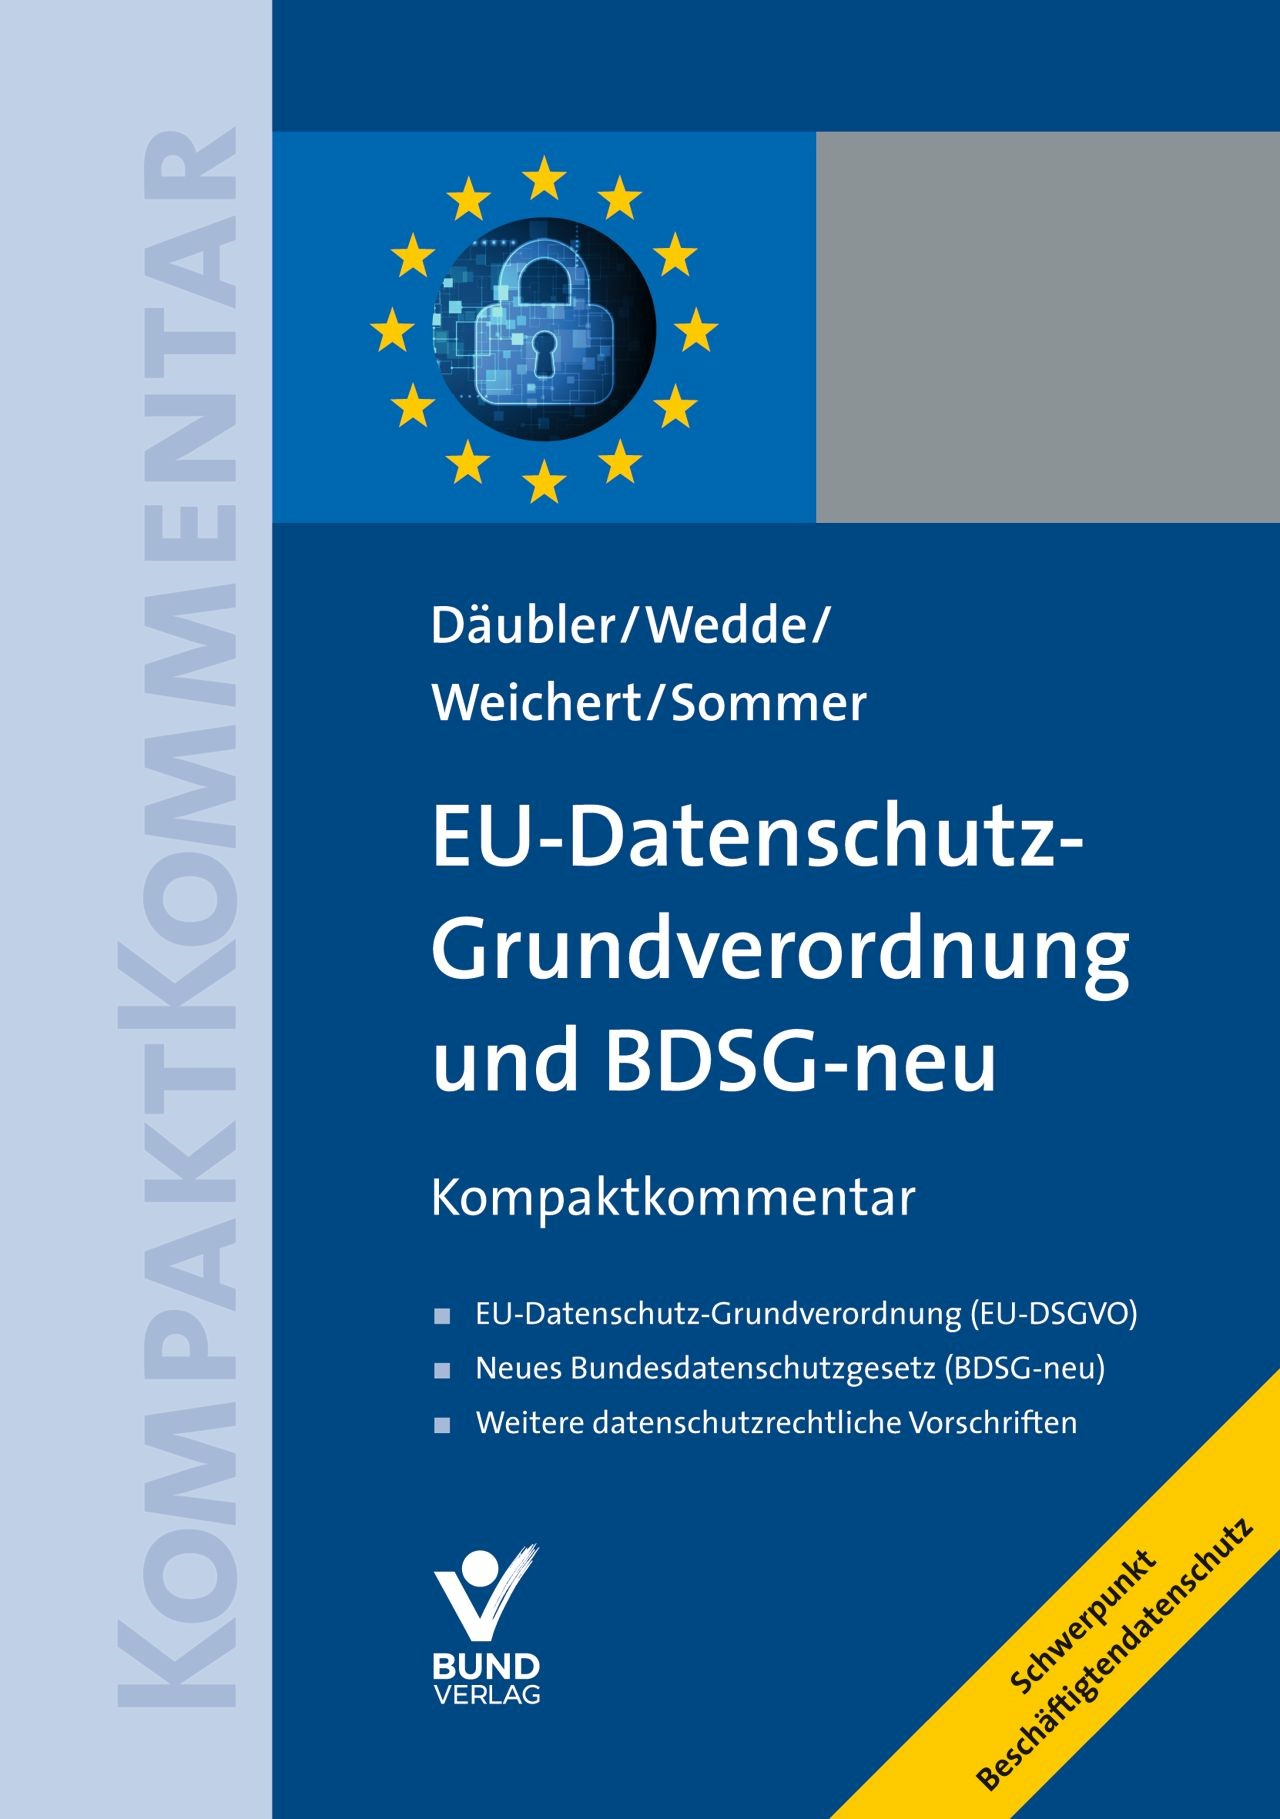 EU-Datenschutz-Grundverordnung und BDSG-neu | Däubler / Wedde / Weichert / Sommer, 2018 | Buch (Cover)